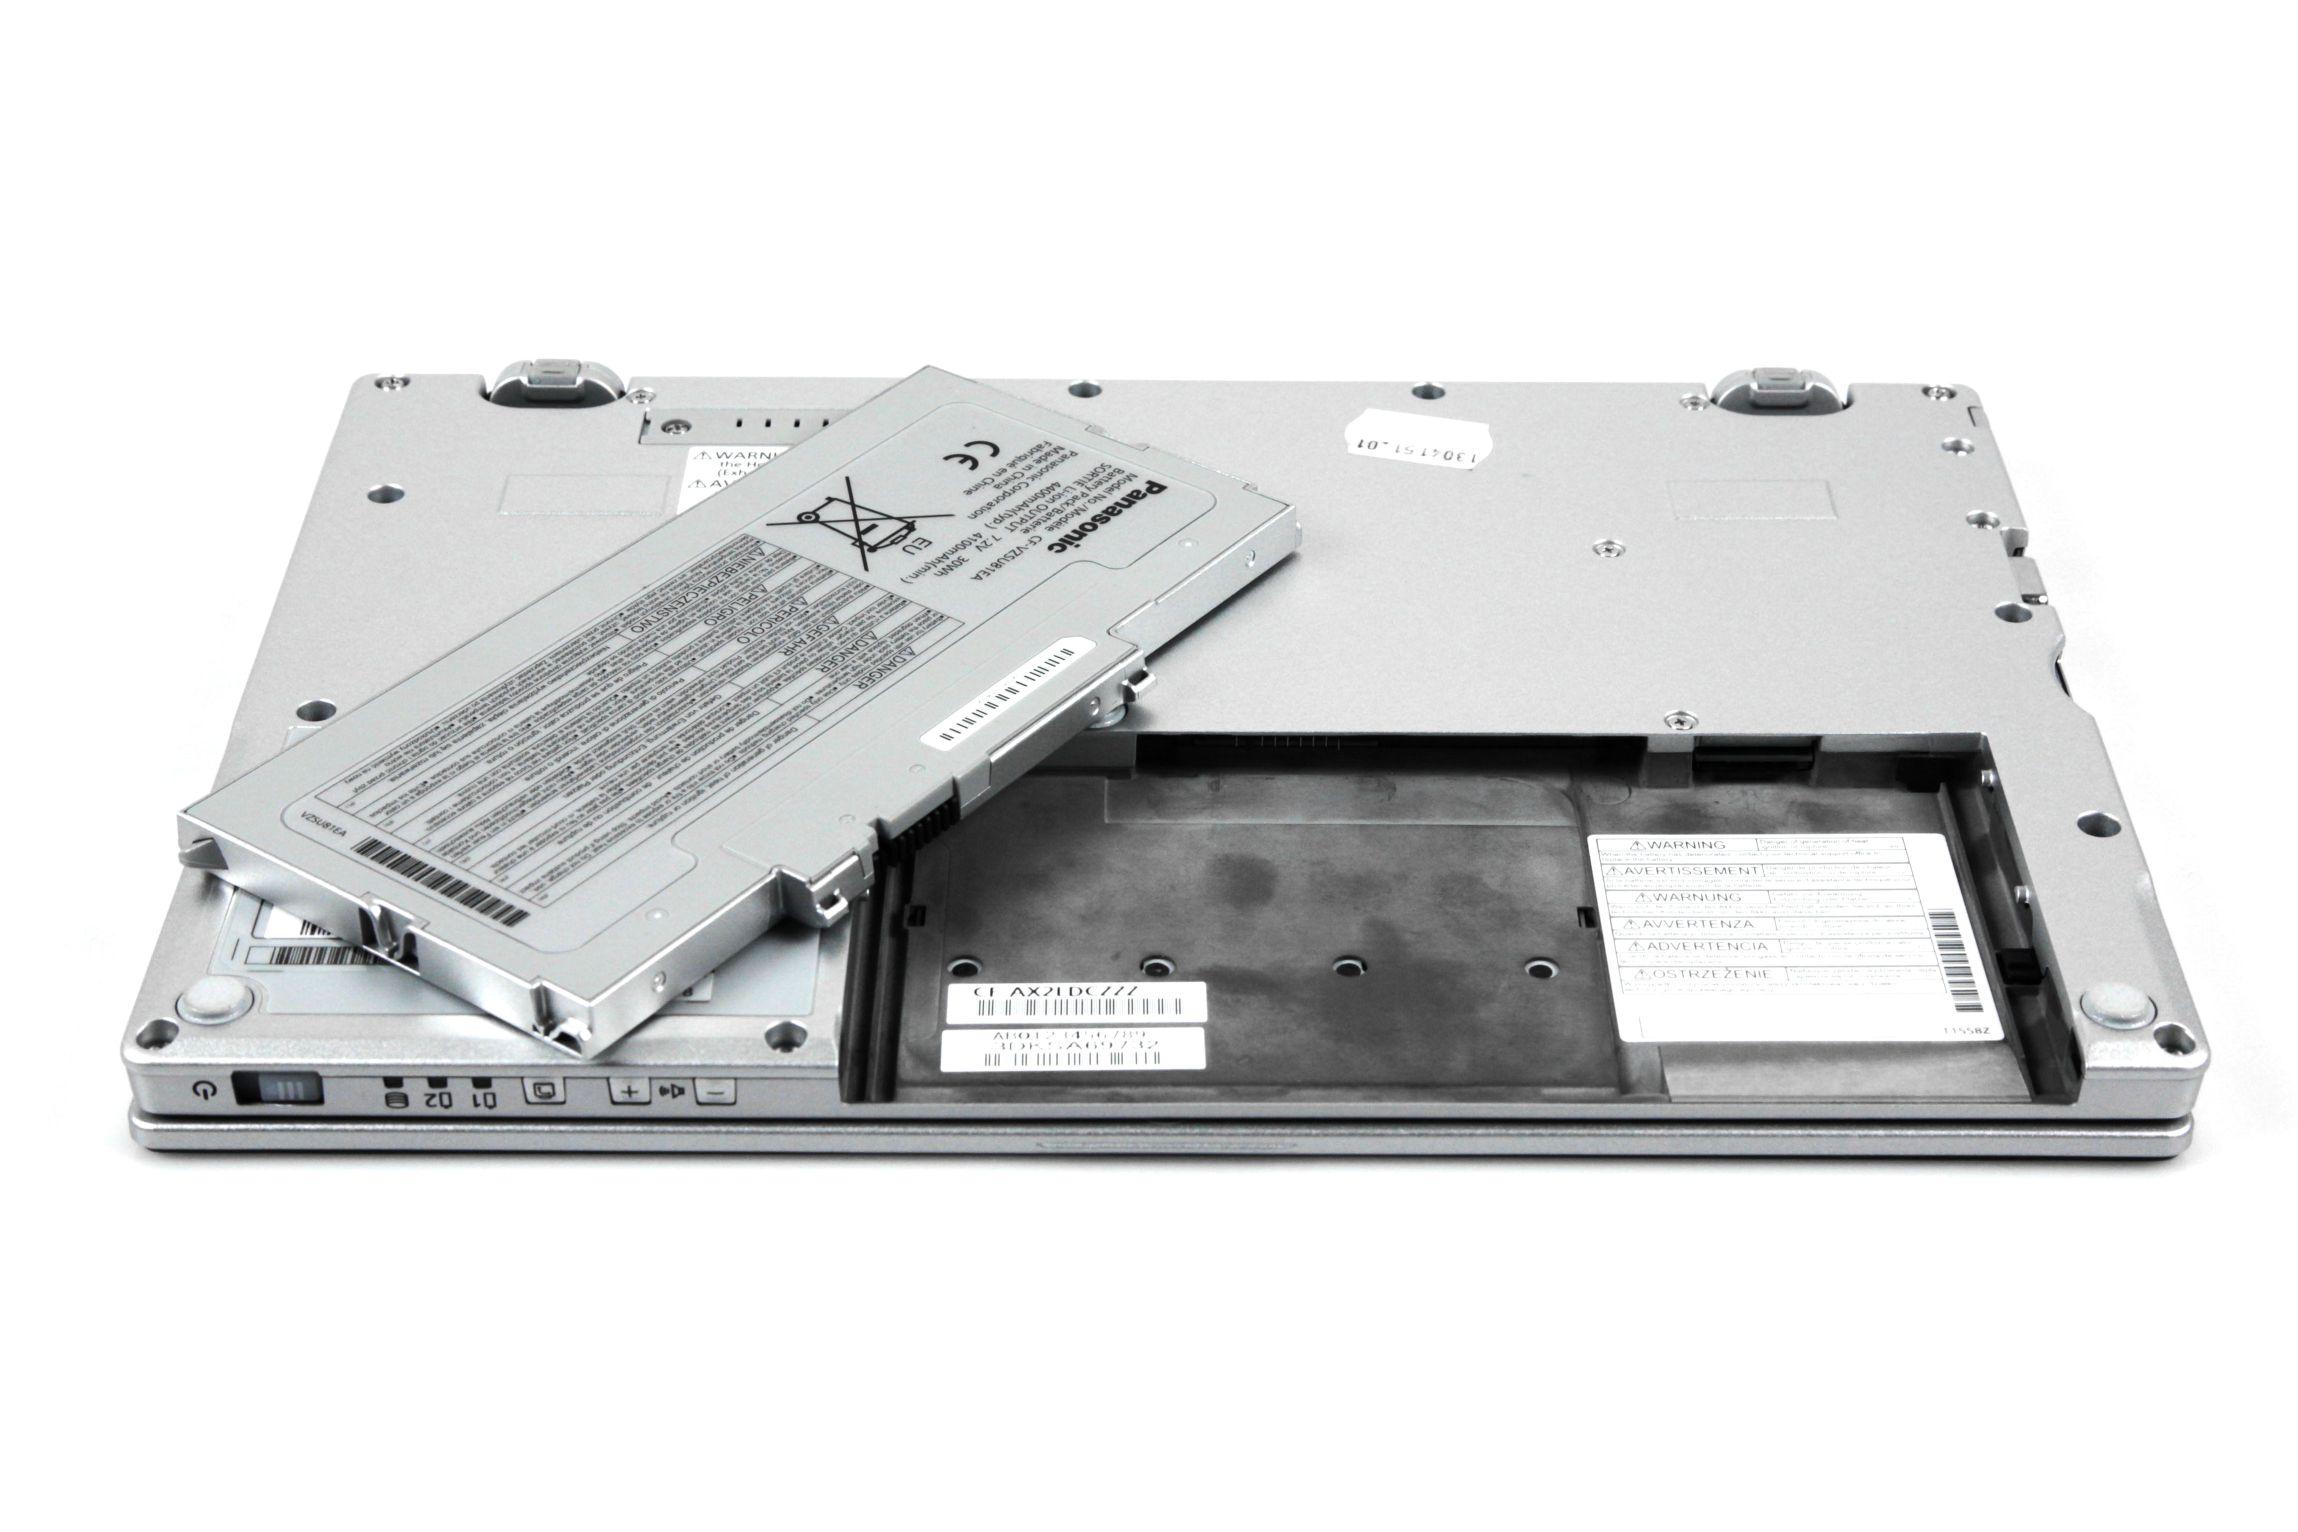 CF-AX2 im Test: Dünnes Toughbook mit Notfallakku und nerviger Tastatur - Im Akkuschacht... (Foto: Nina Sebayang/Golem.de)